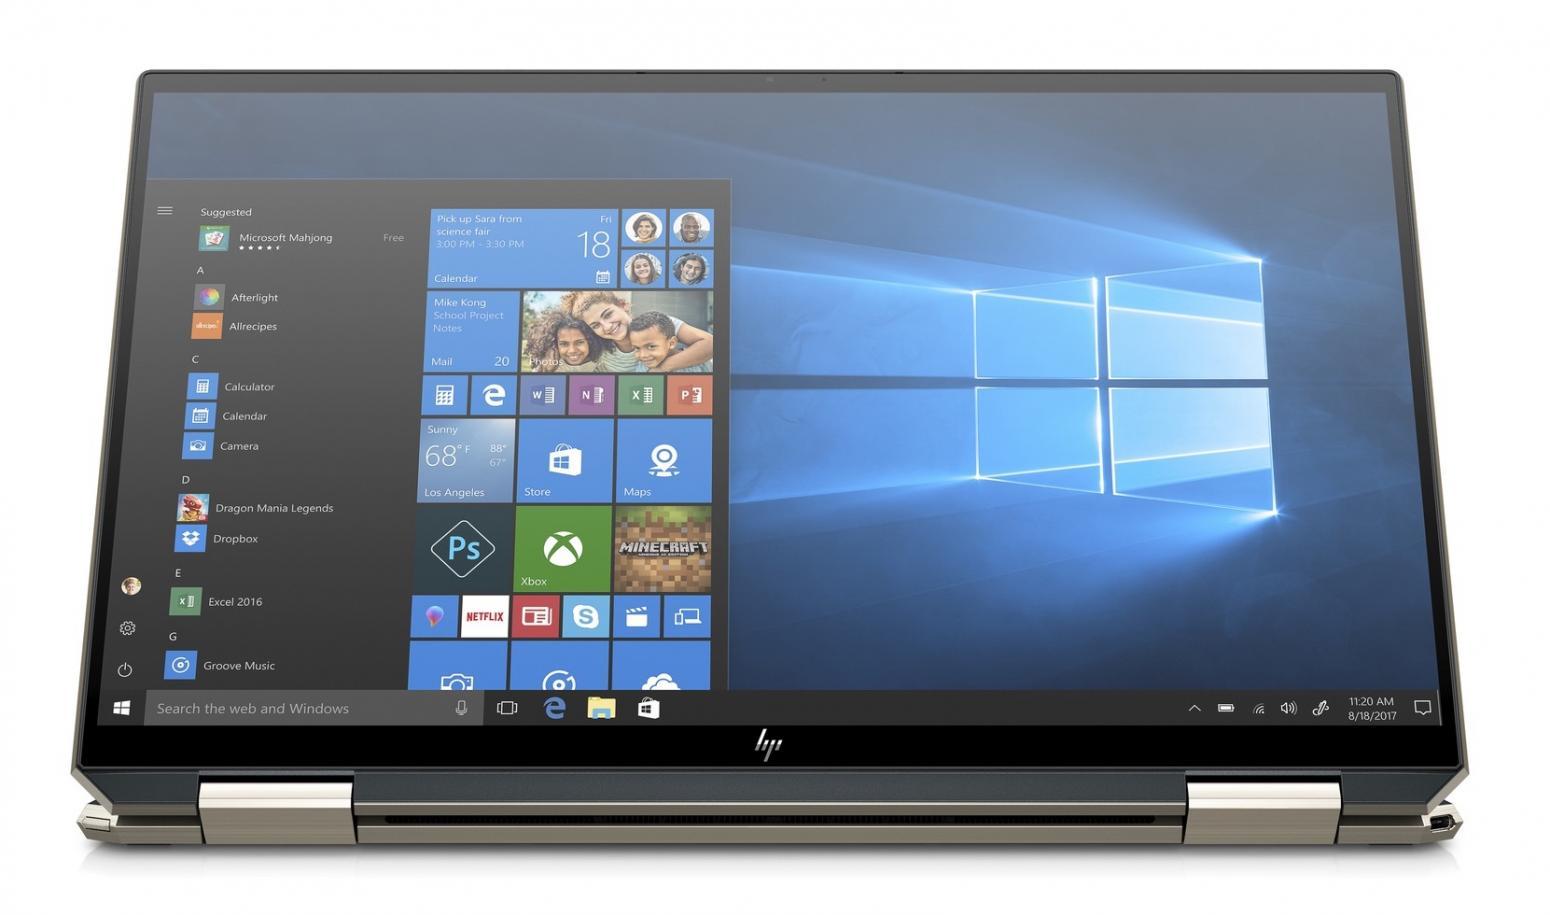 Ordinateur portable HP Spectre x360 13-aw0009nf Bleu Noir - photo 3